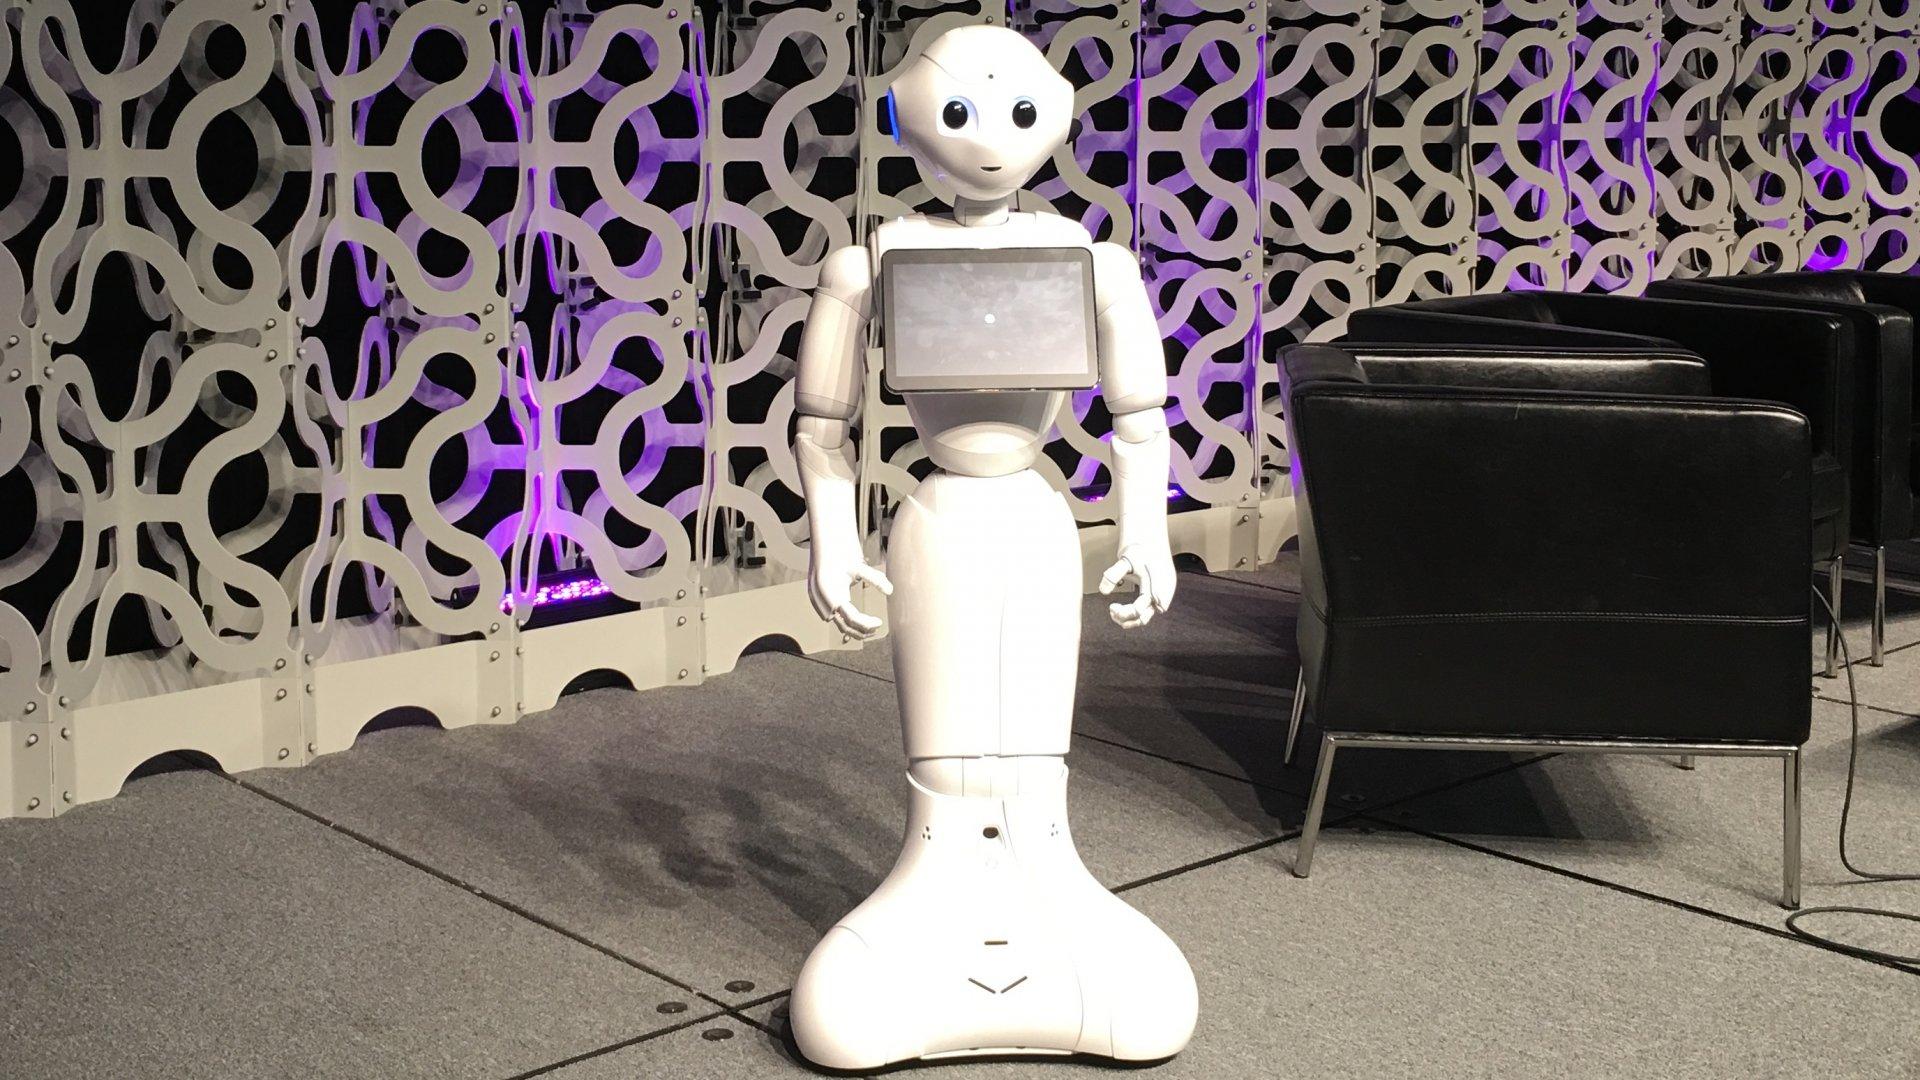 Aldebaran's 'Pepper' robot onstage at SXSW.